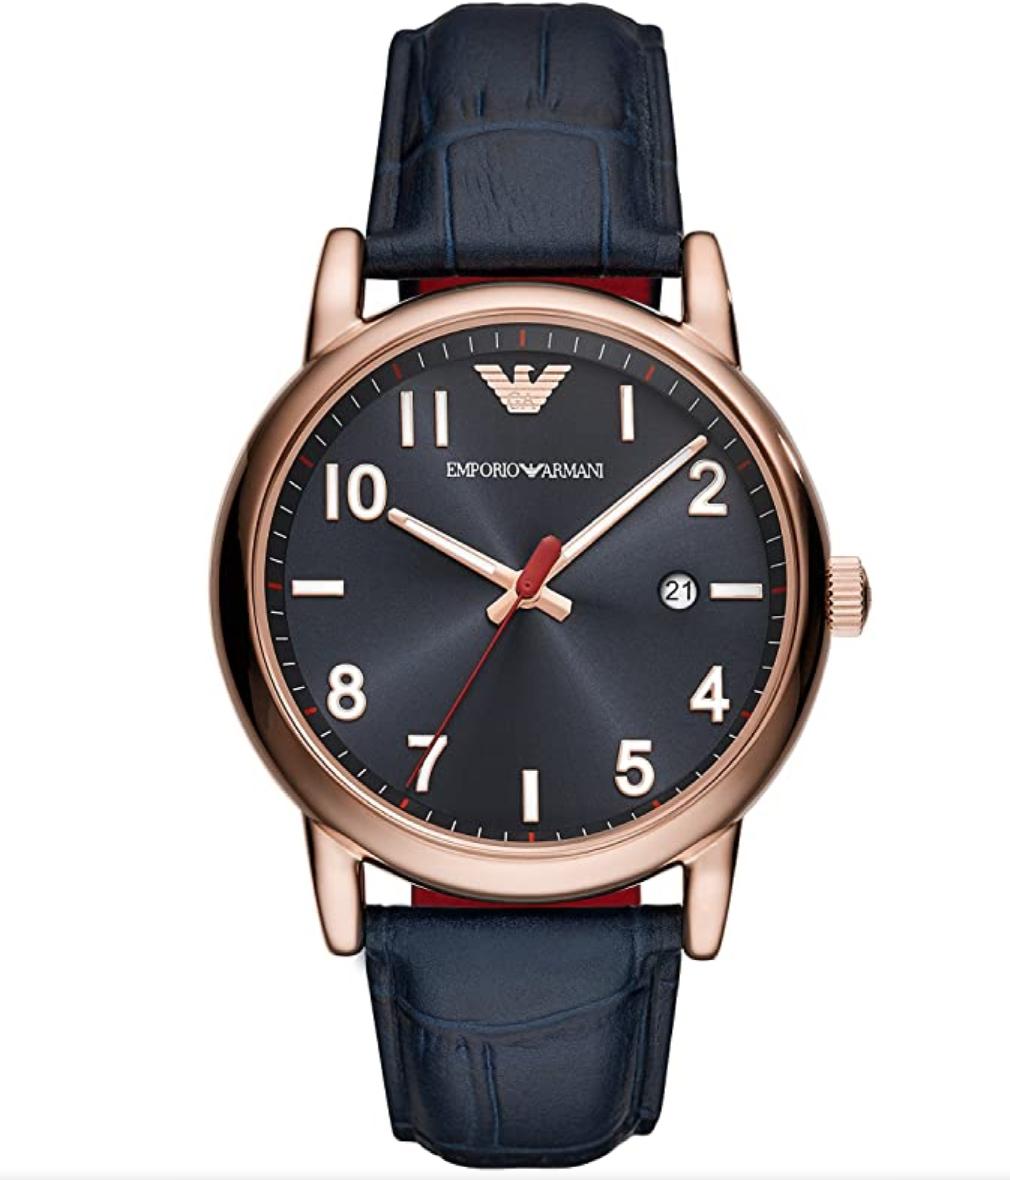 Reloj Emporio Armani AR1135 (Amazon Francia)